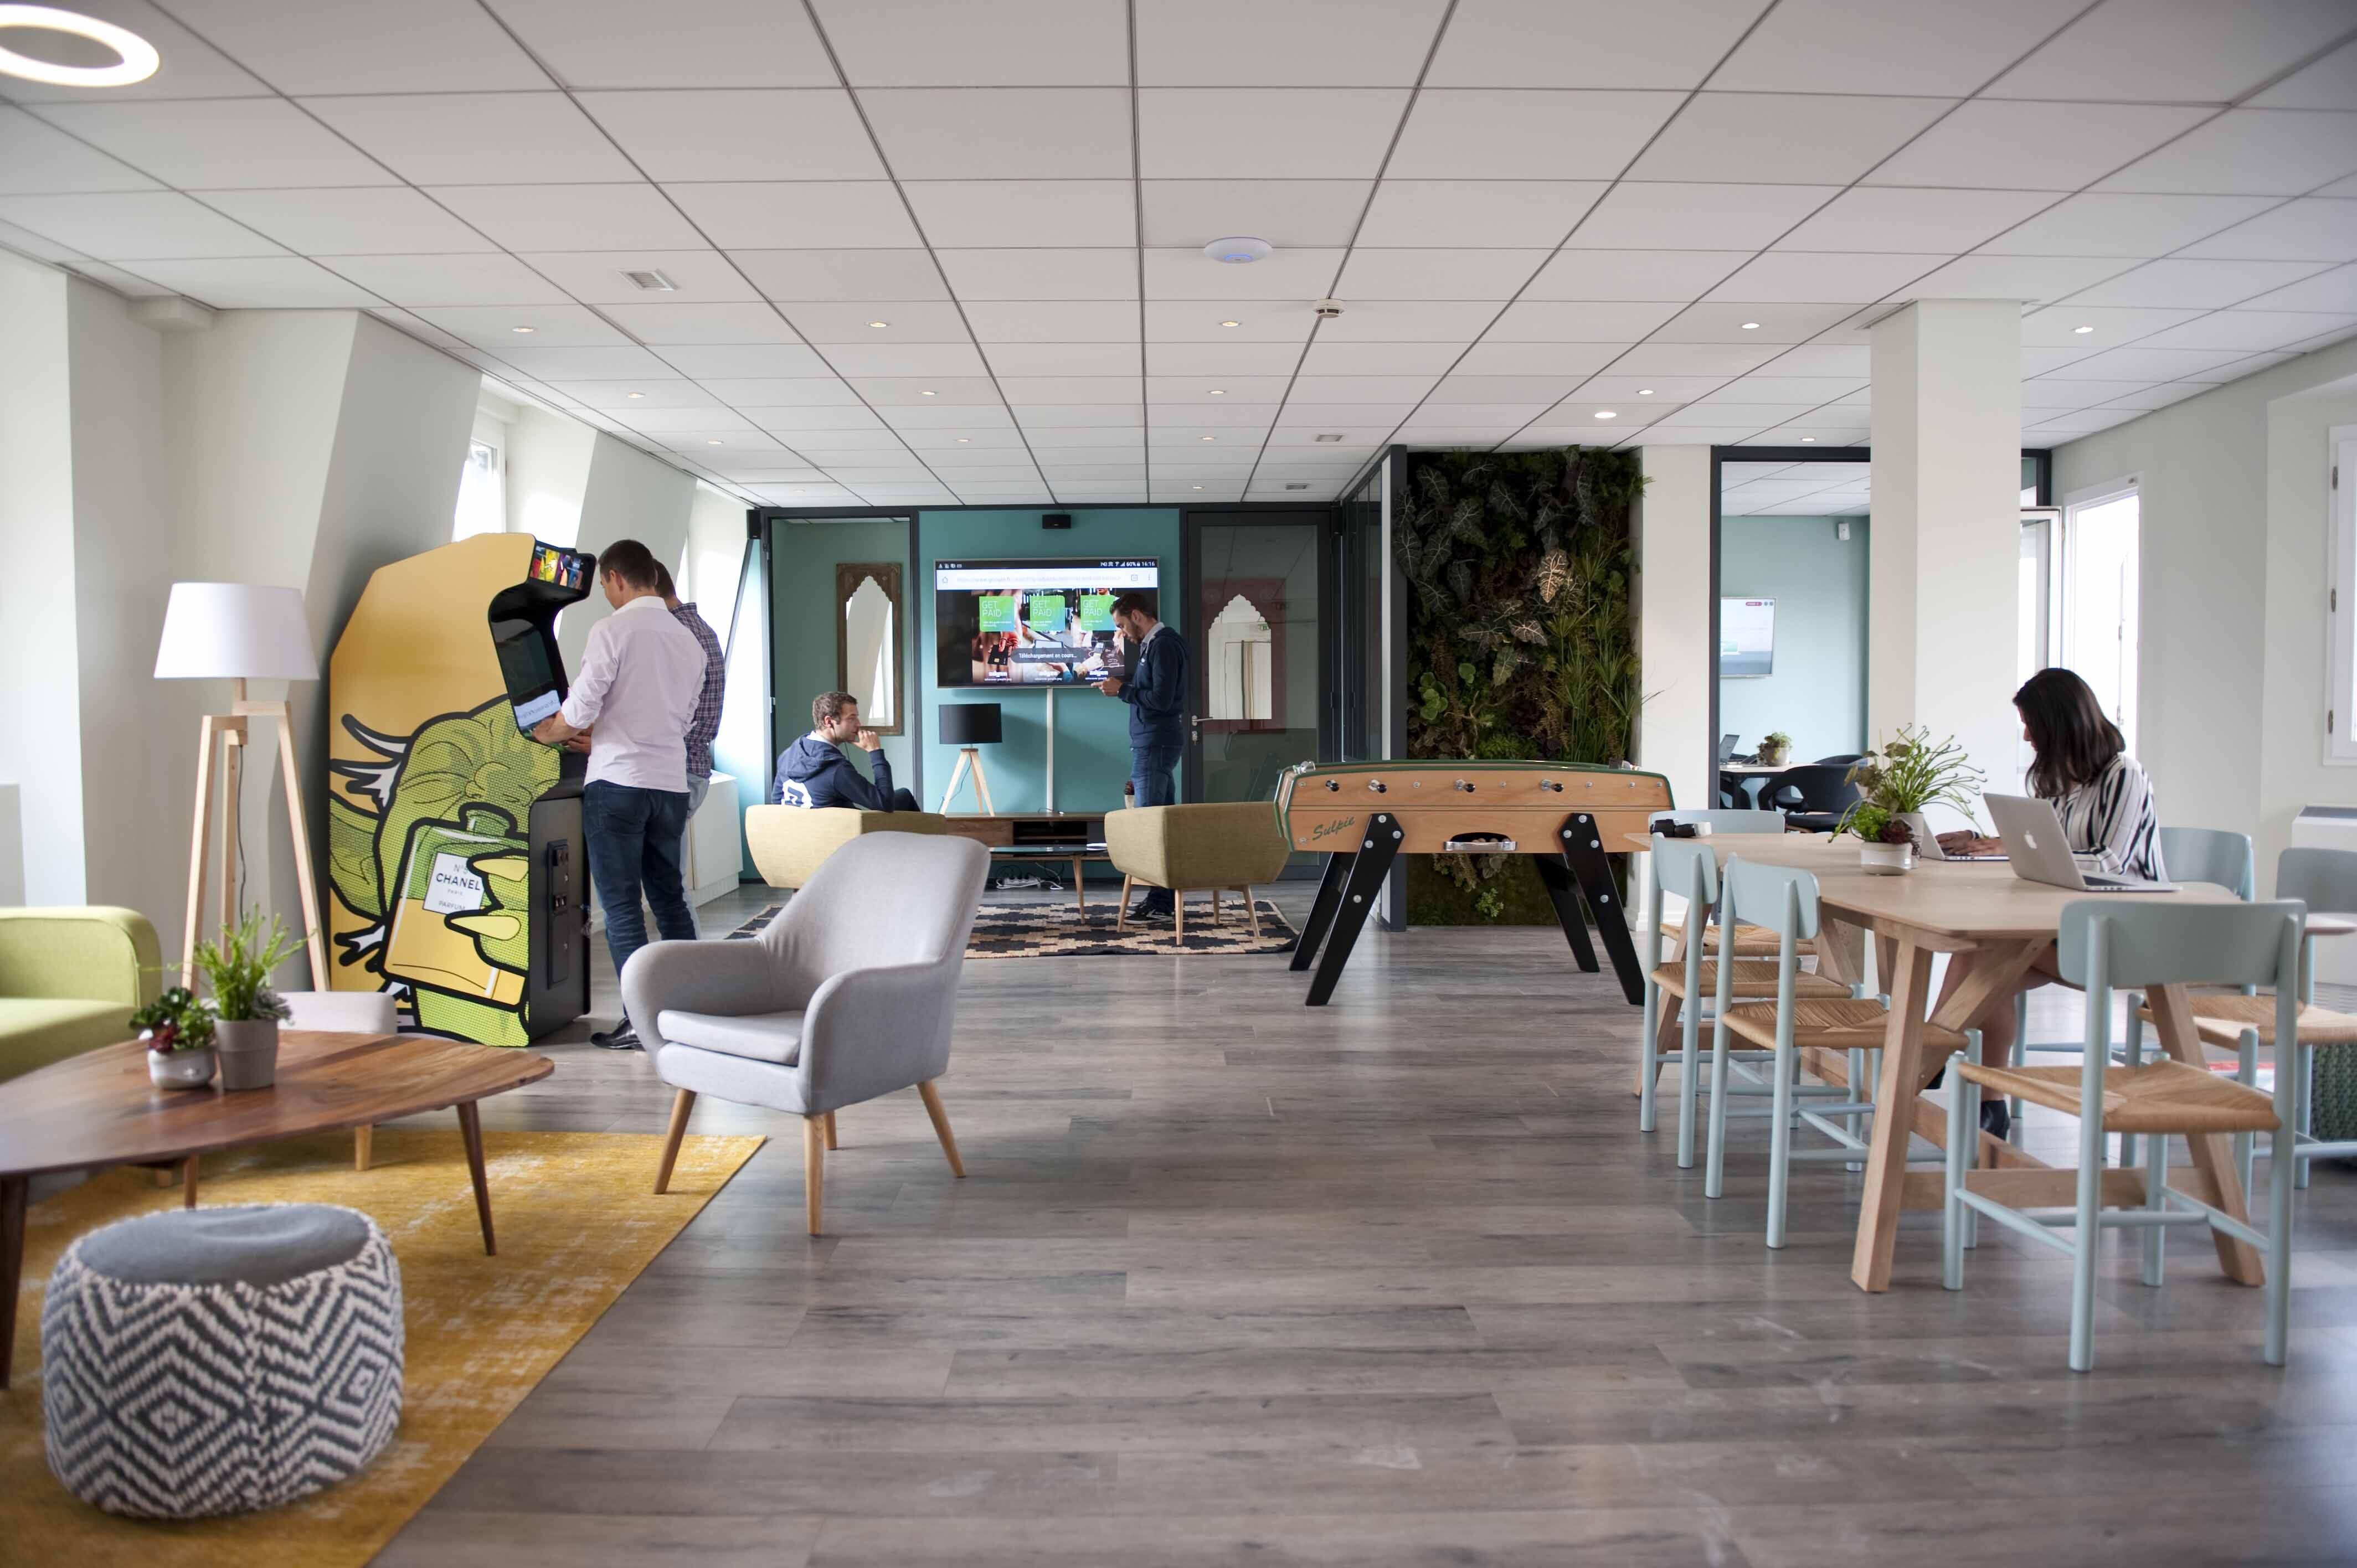 baby foot startup et recrutement enfin des chiffres. Black Bedroom Furniture Sets. Home Design Ideas